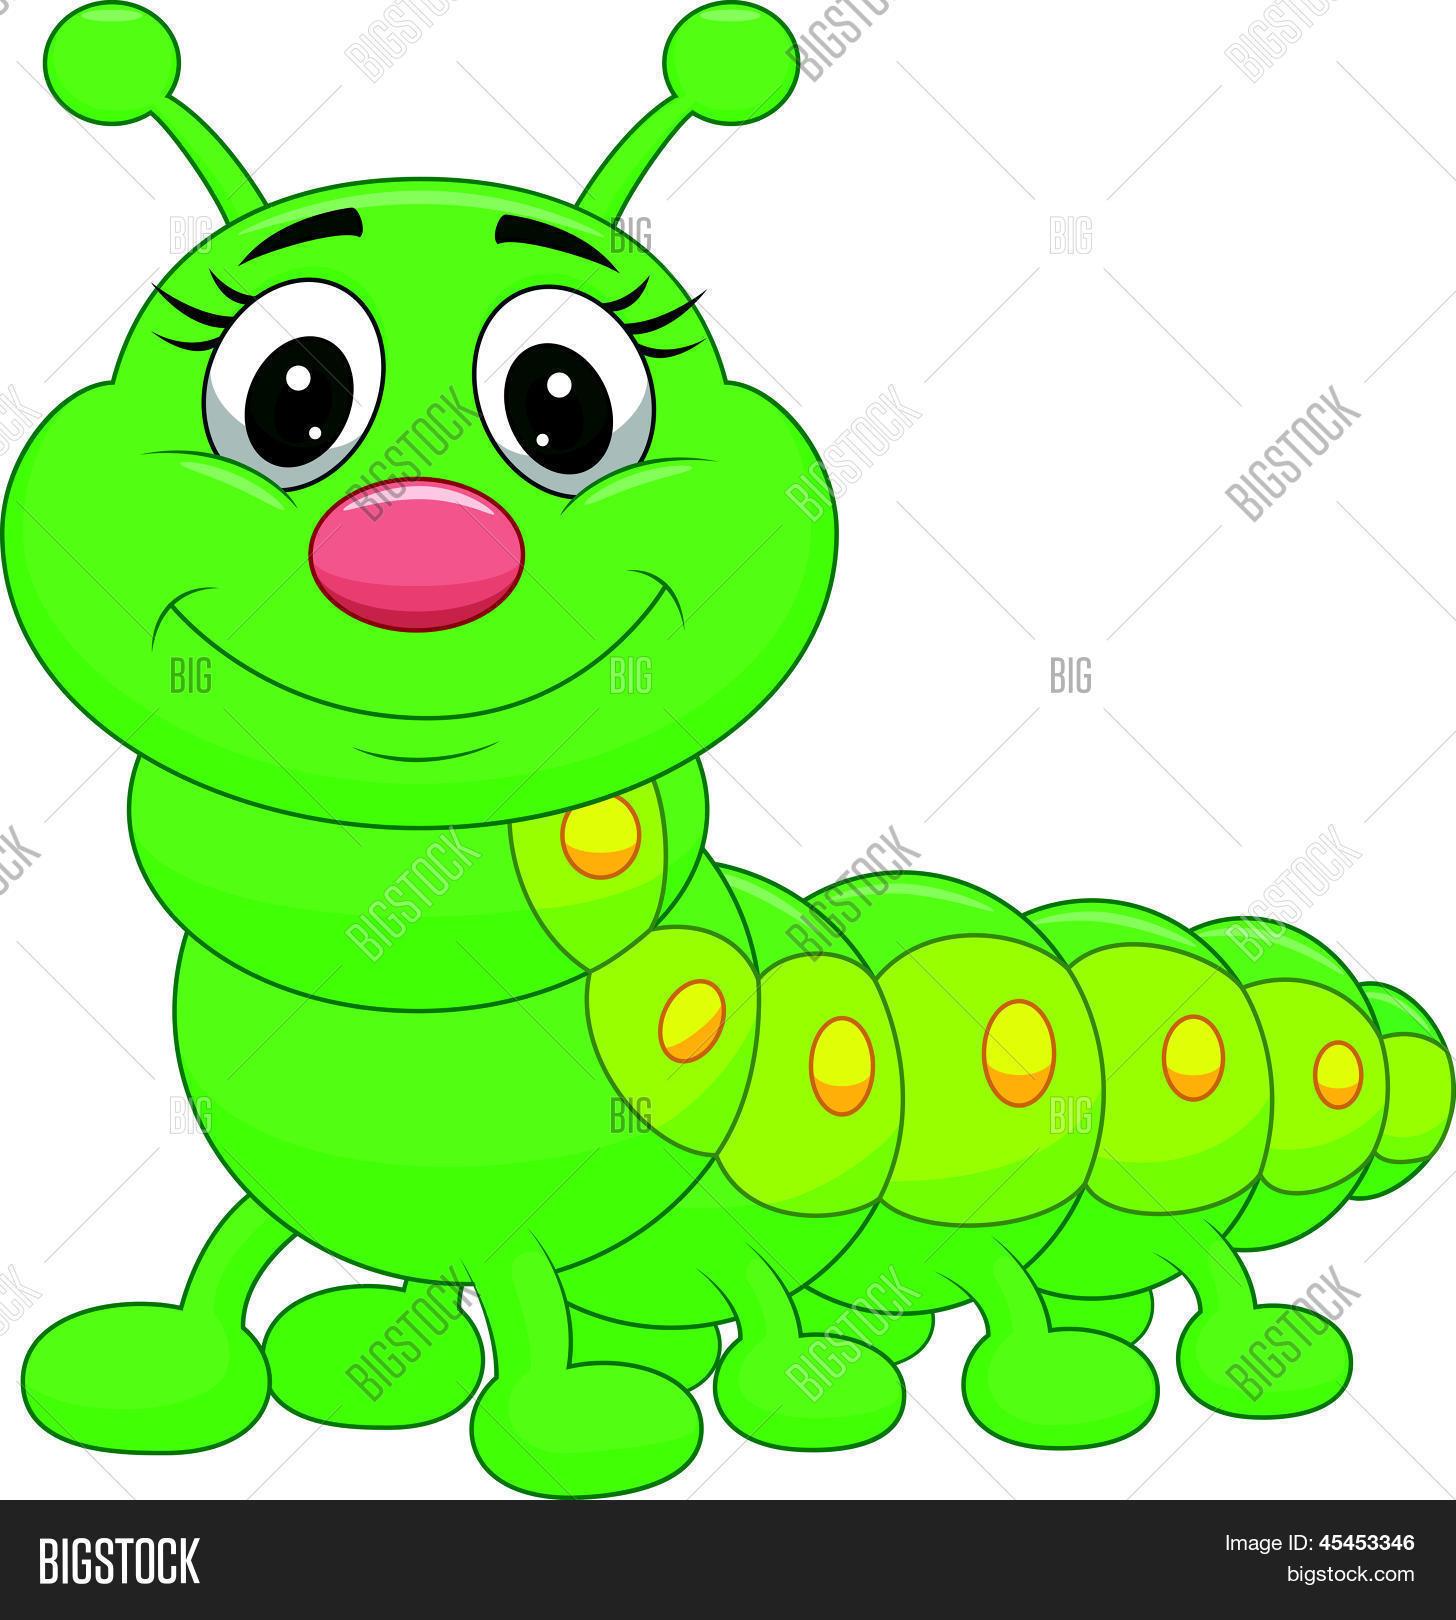 Cute Green Caterpillar Cartoon Vector  for Clipart Cute Caterpillar  75tgx